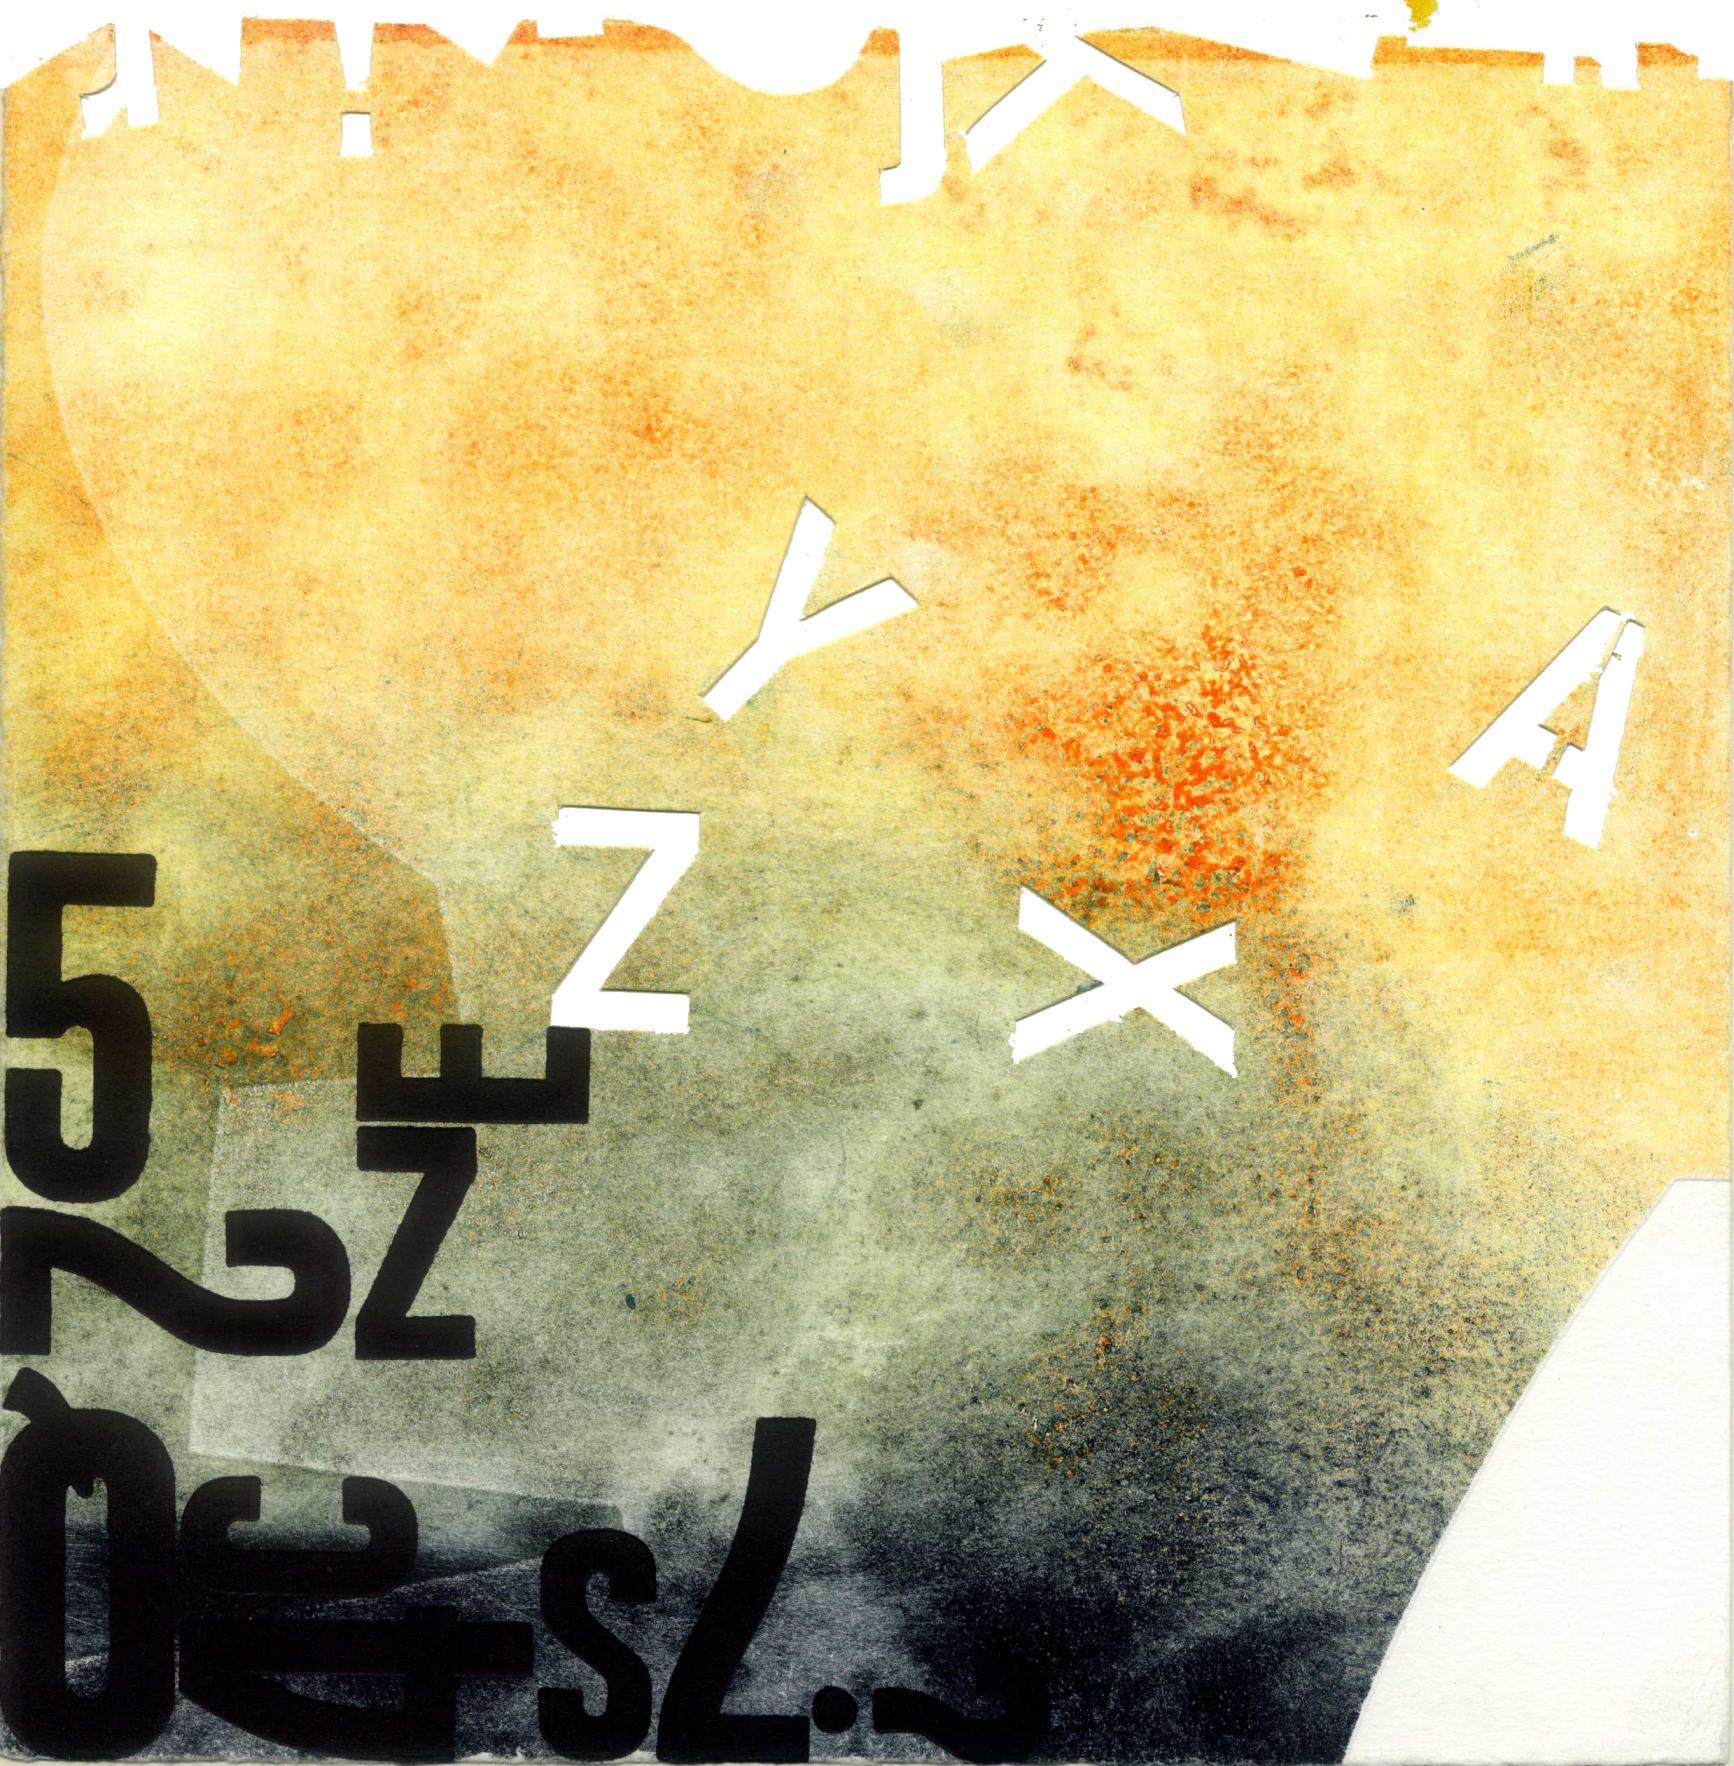 De la A a la Z. Horizont (2016) - Antoni P. Vidal